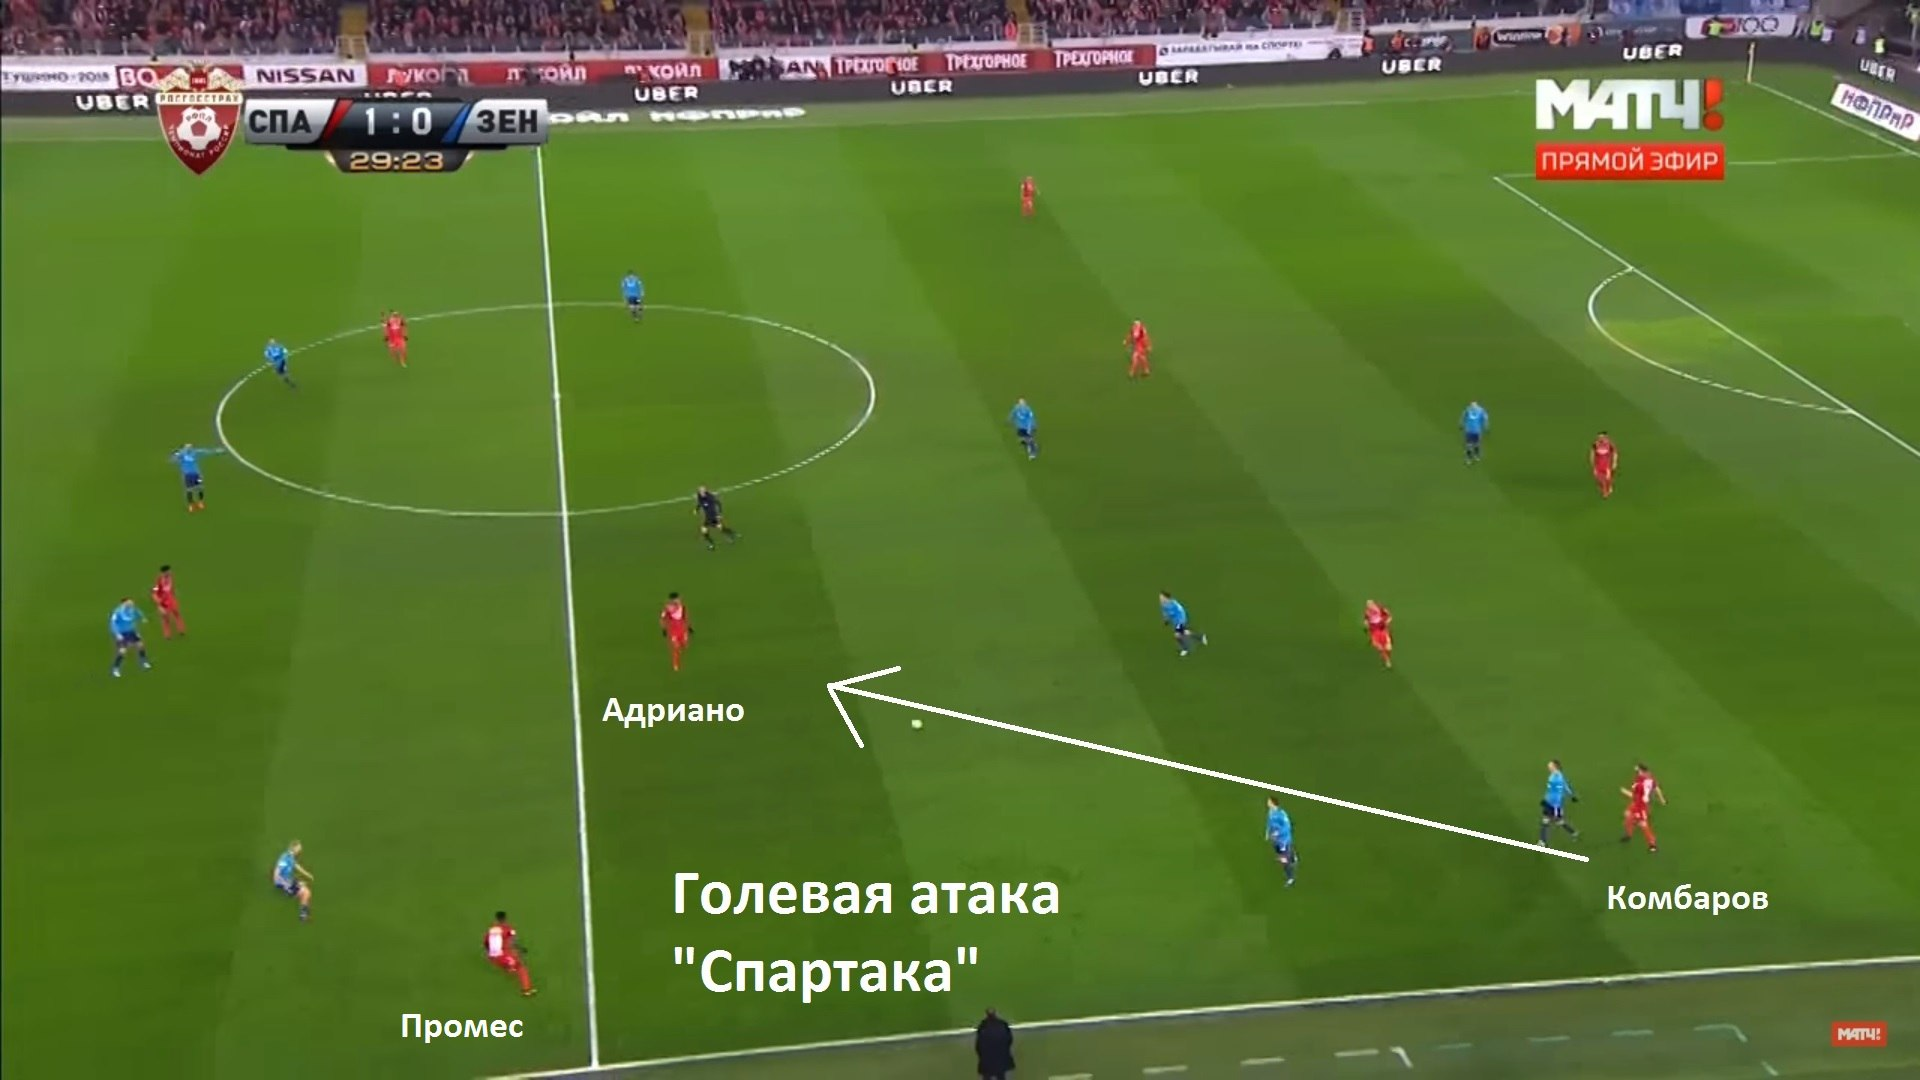 Левый фланг не пострадает, а центр – может. Каким будет «Спартак» без Комбарова?